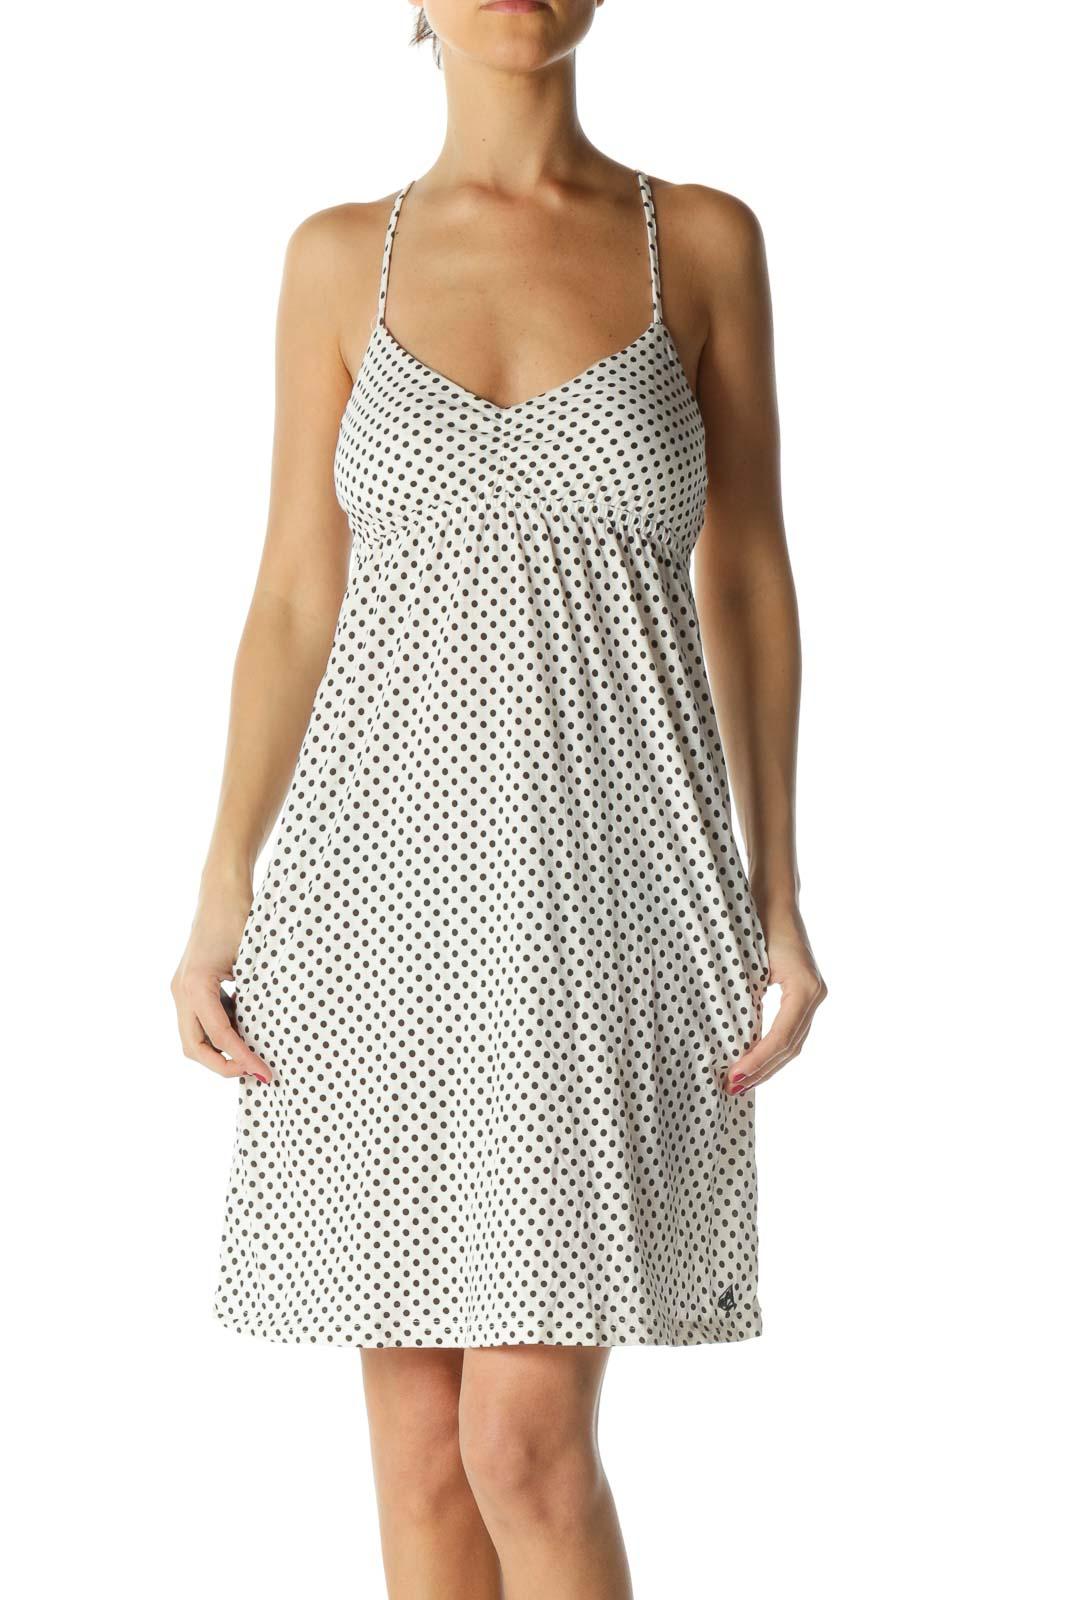 Black and White Polka-Dot Dress